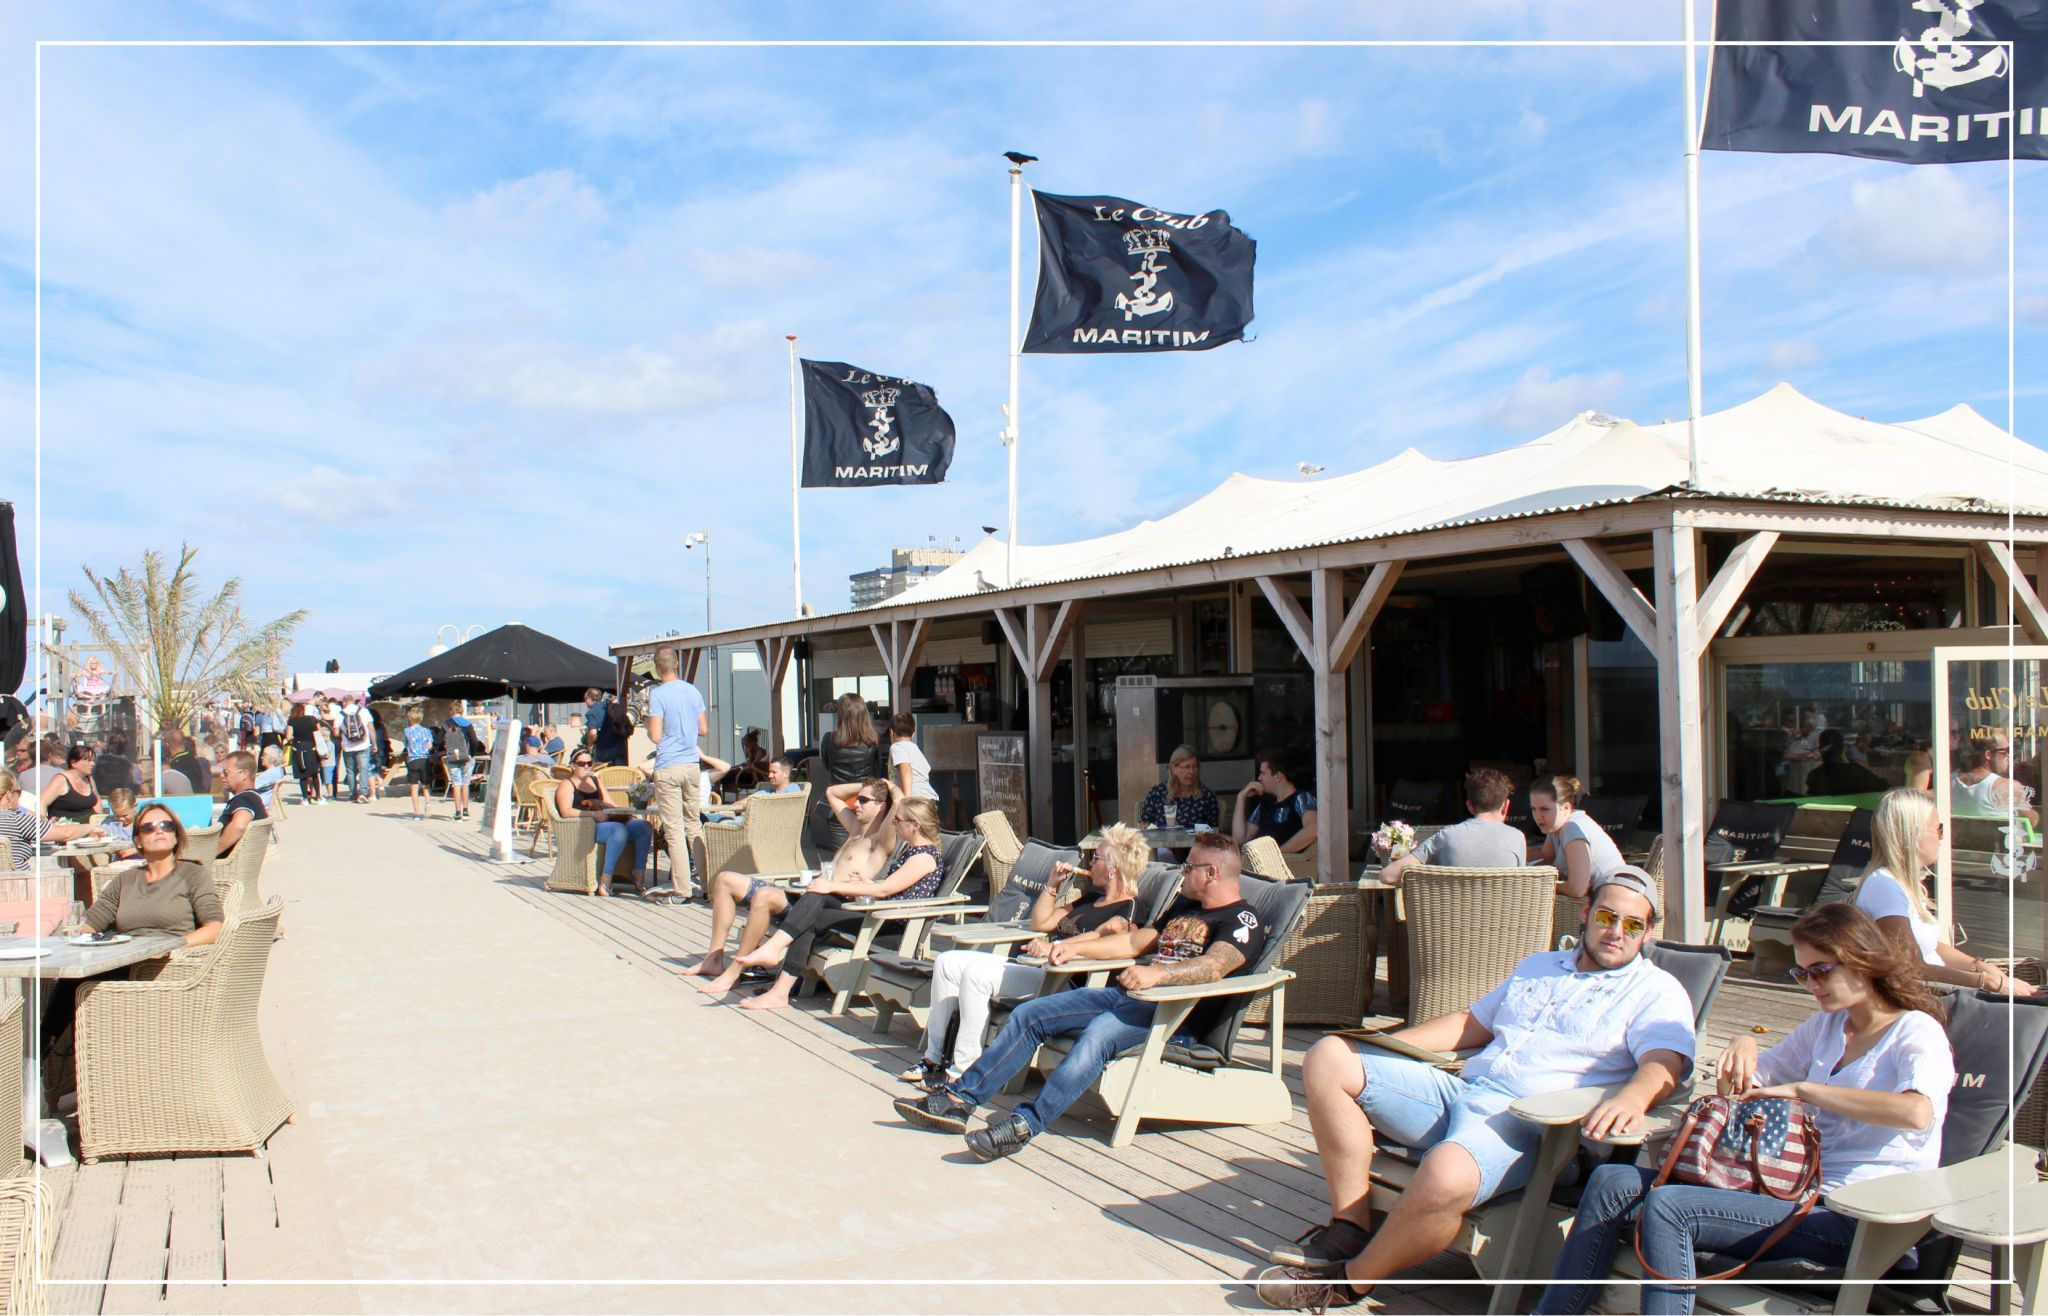 Le Maritim hotspot le maritim beaches the and by